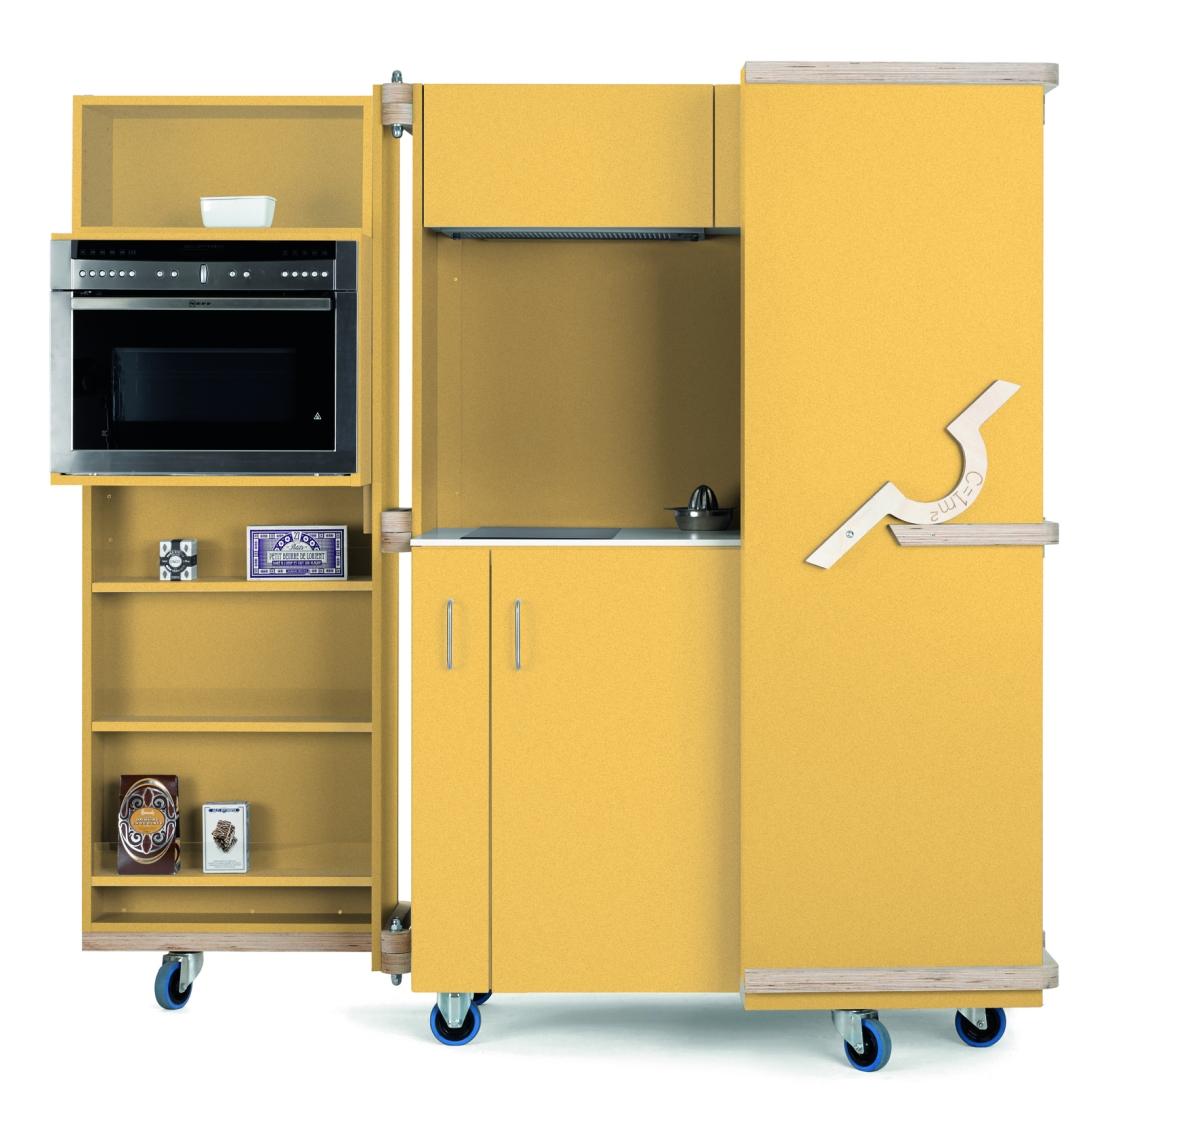 neff invente la plus petite cuisine du monde go t de food. Black Bedroom Furniture Sets. Home Design Ideas